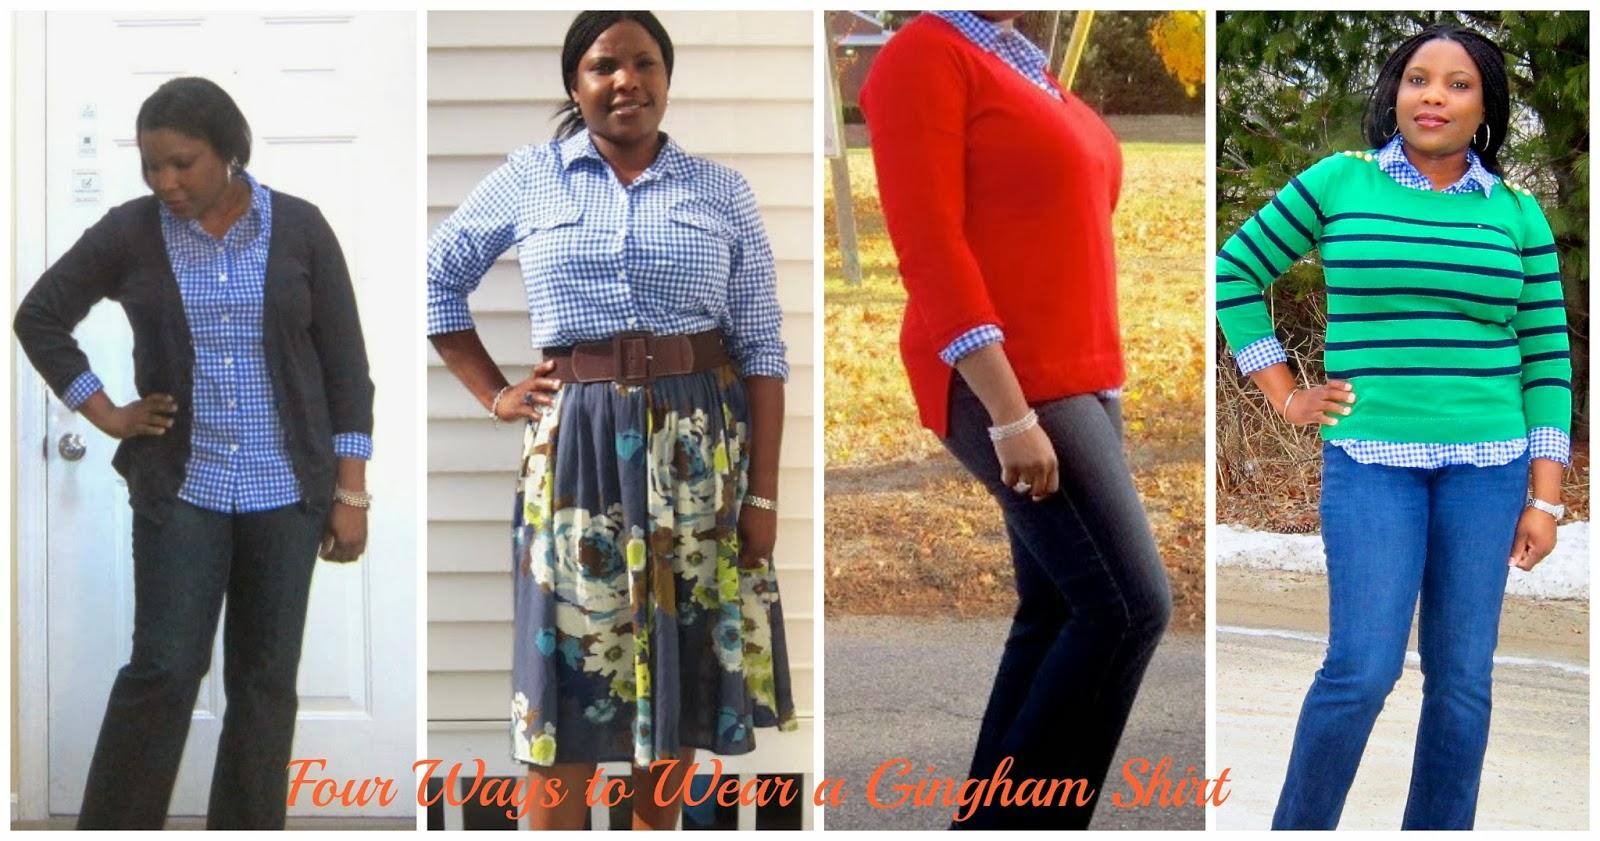 Four ways to wear gingham, Blue gingham, blue Plaid shirt